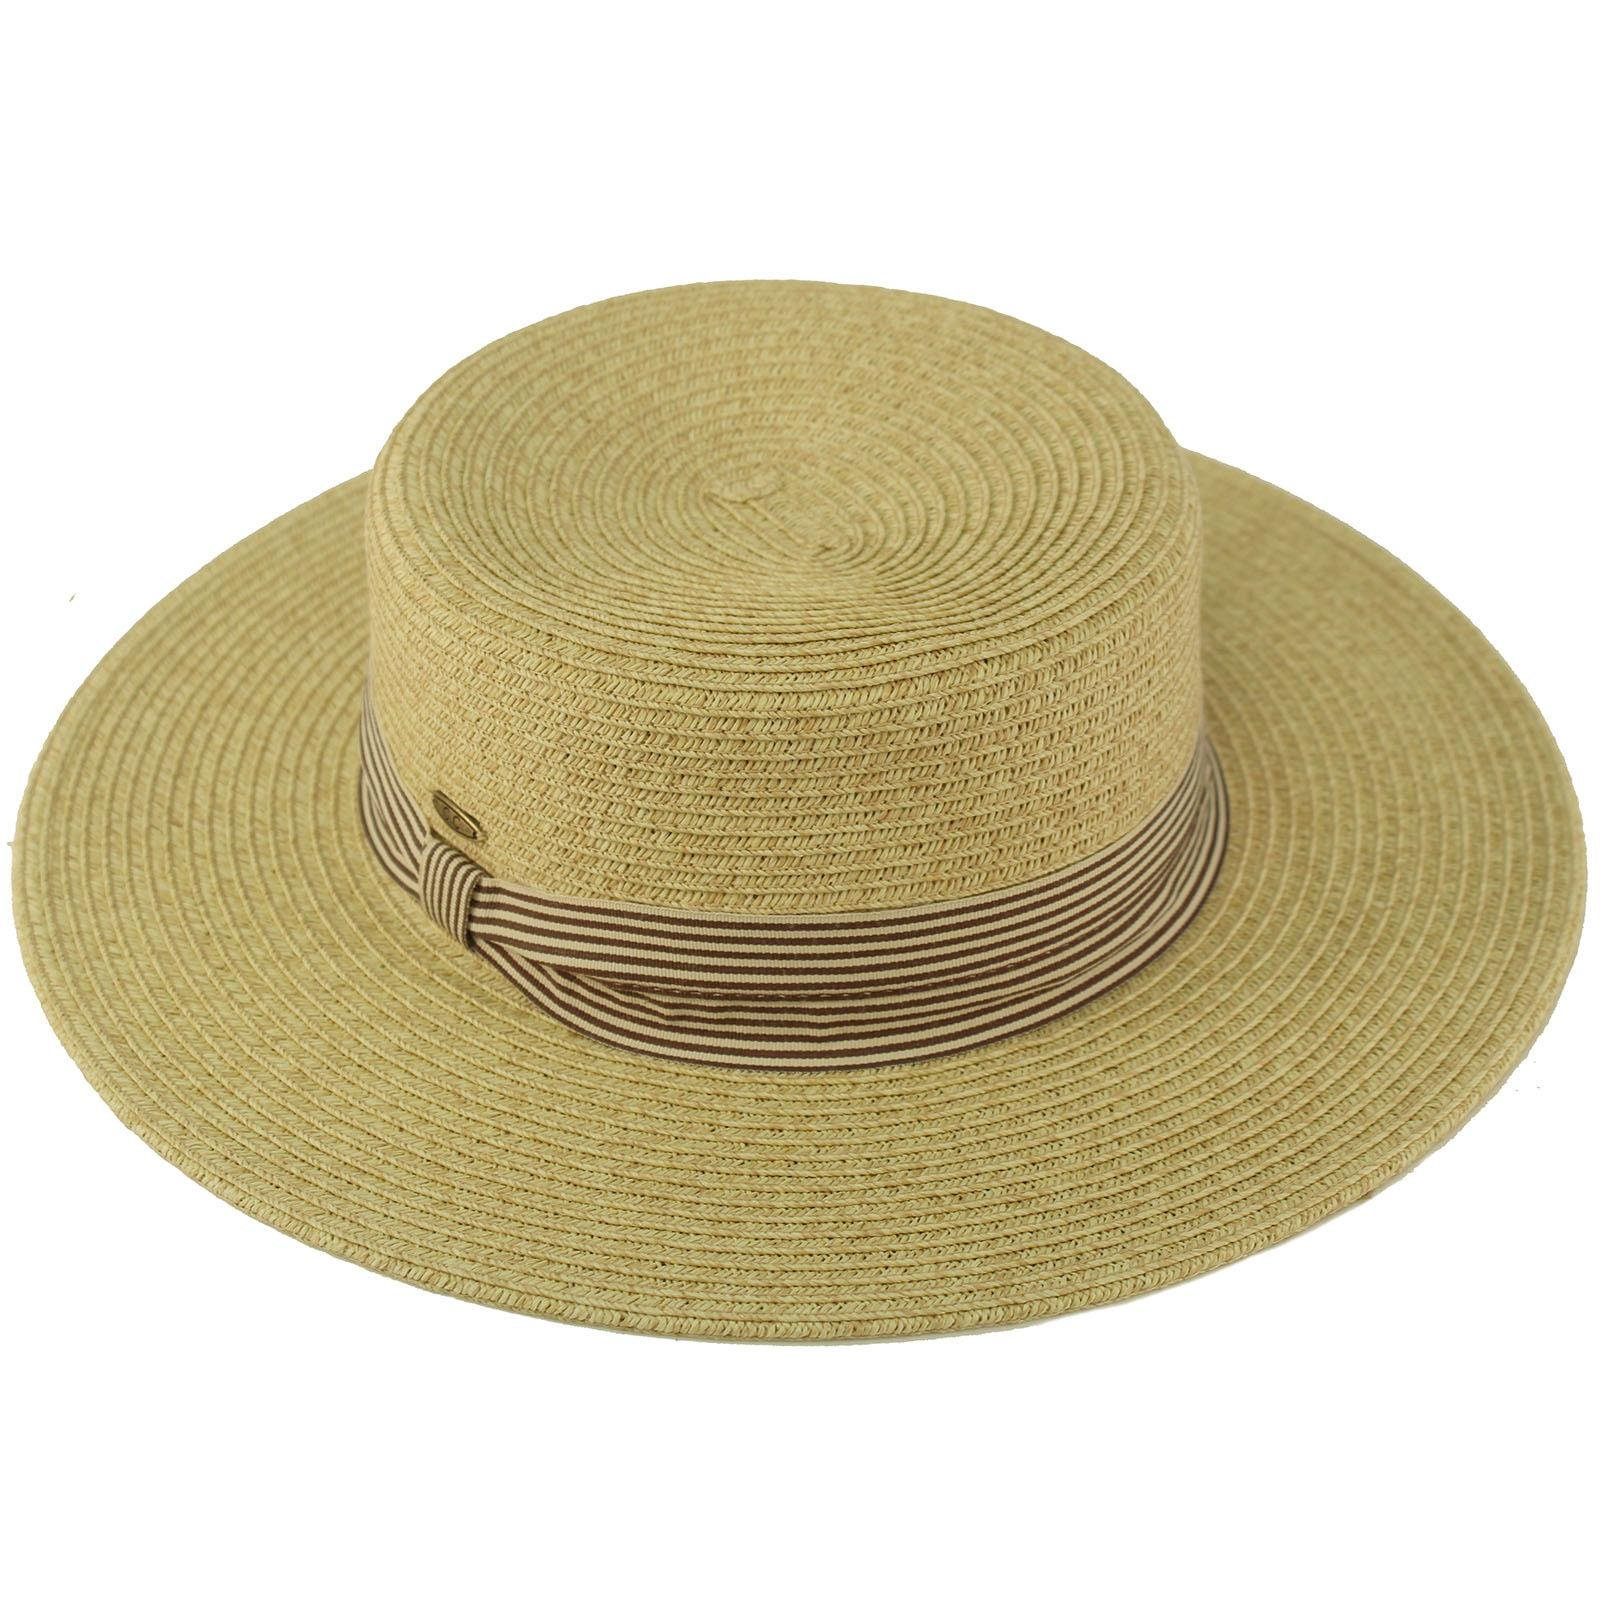 C.C Unisex Grosgrain Band Wide Porkpie Boater Derby Flat Top Fedora Sun Hat Lt. Natural/Brown Stripe